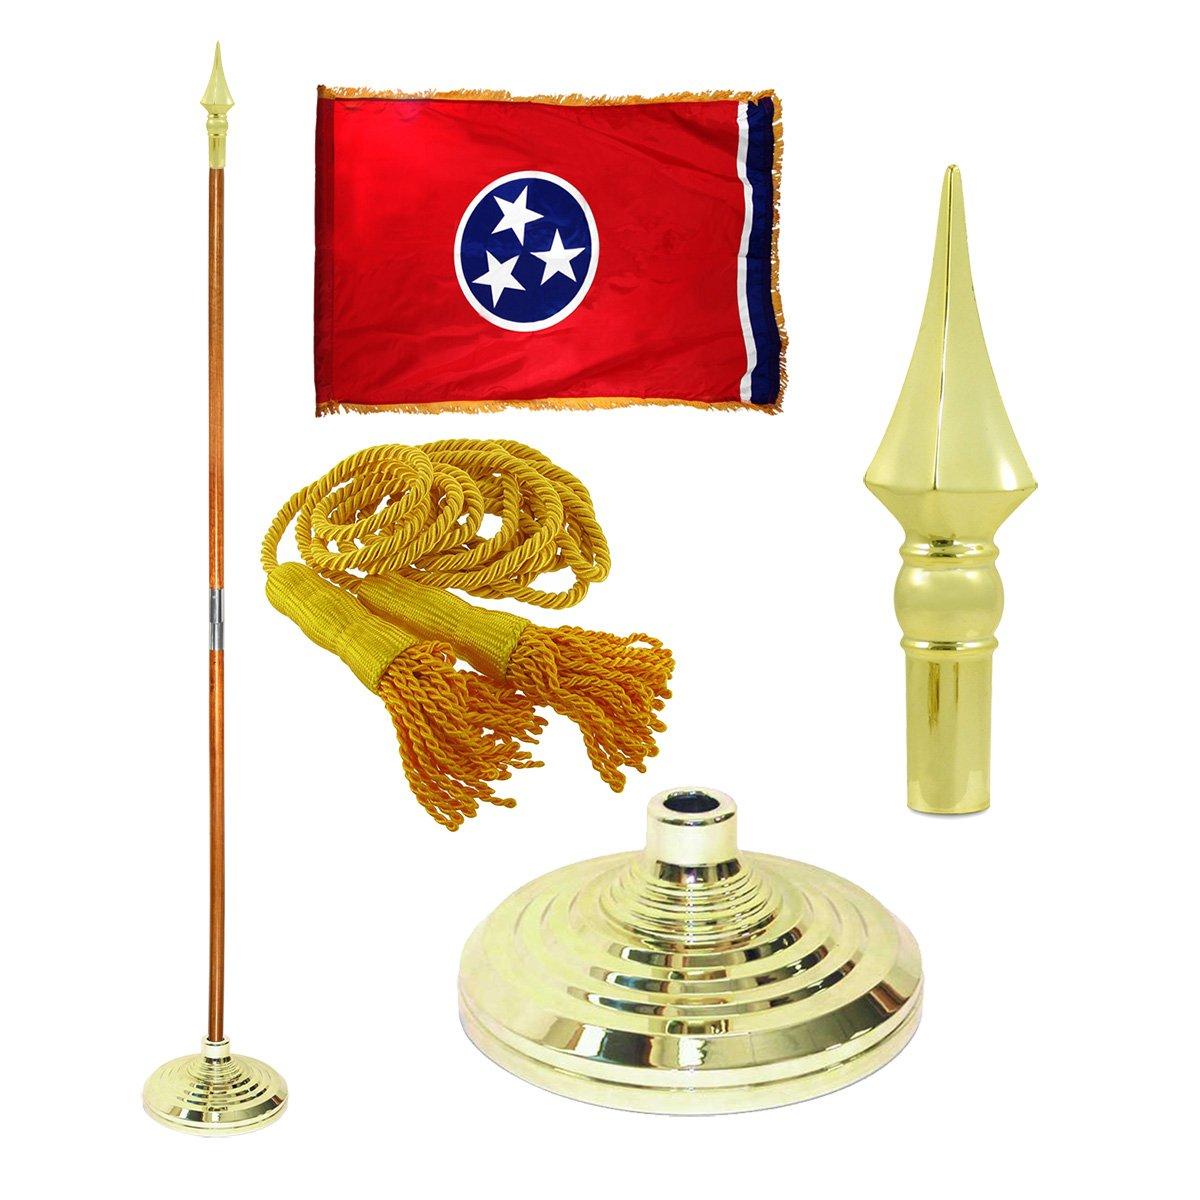 Tennessee 3ft X 5ft Flag, Flagpole, Base, and Tassel (8 Ft Oak Pole, Plastic Spear)